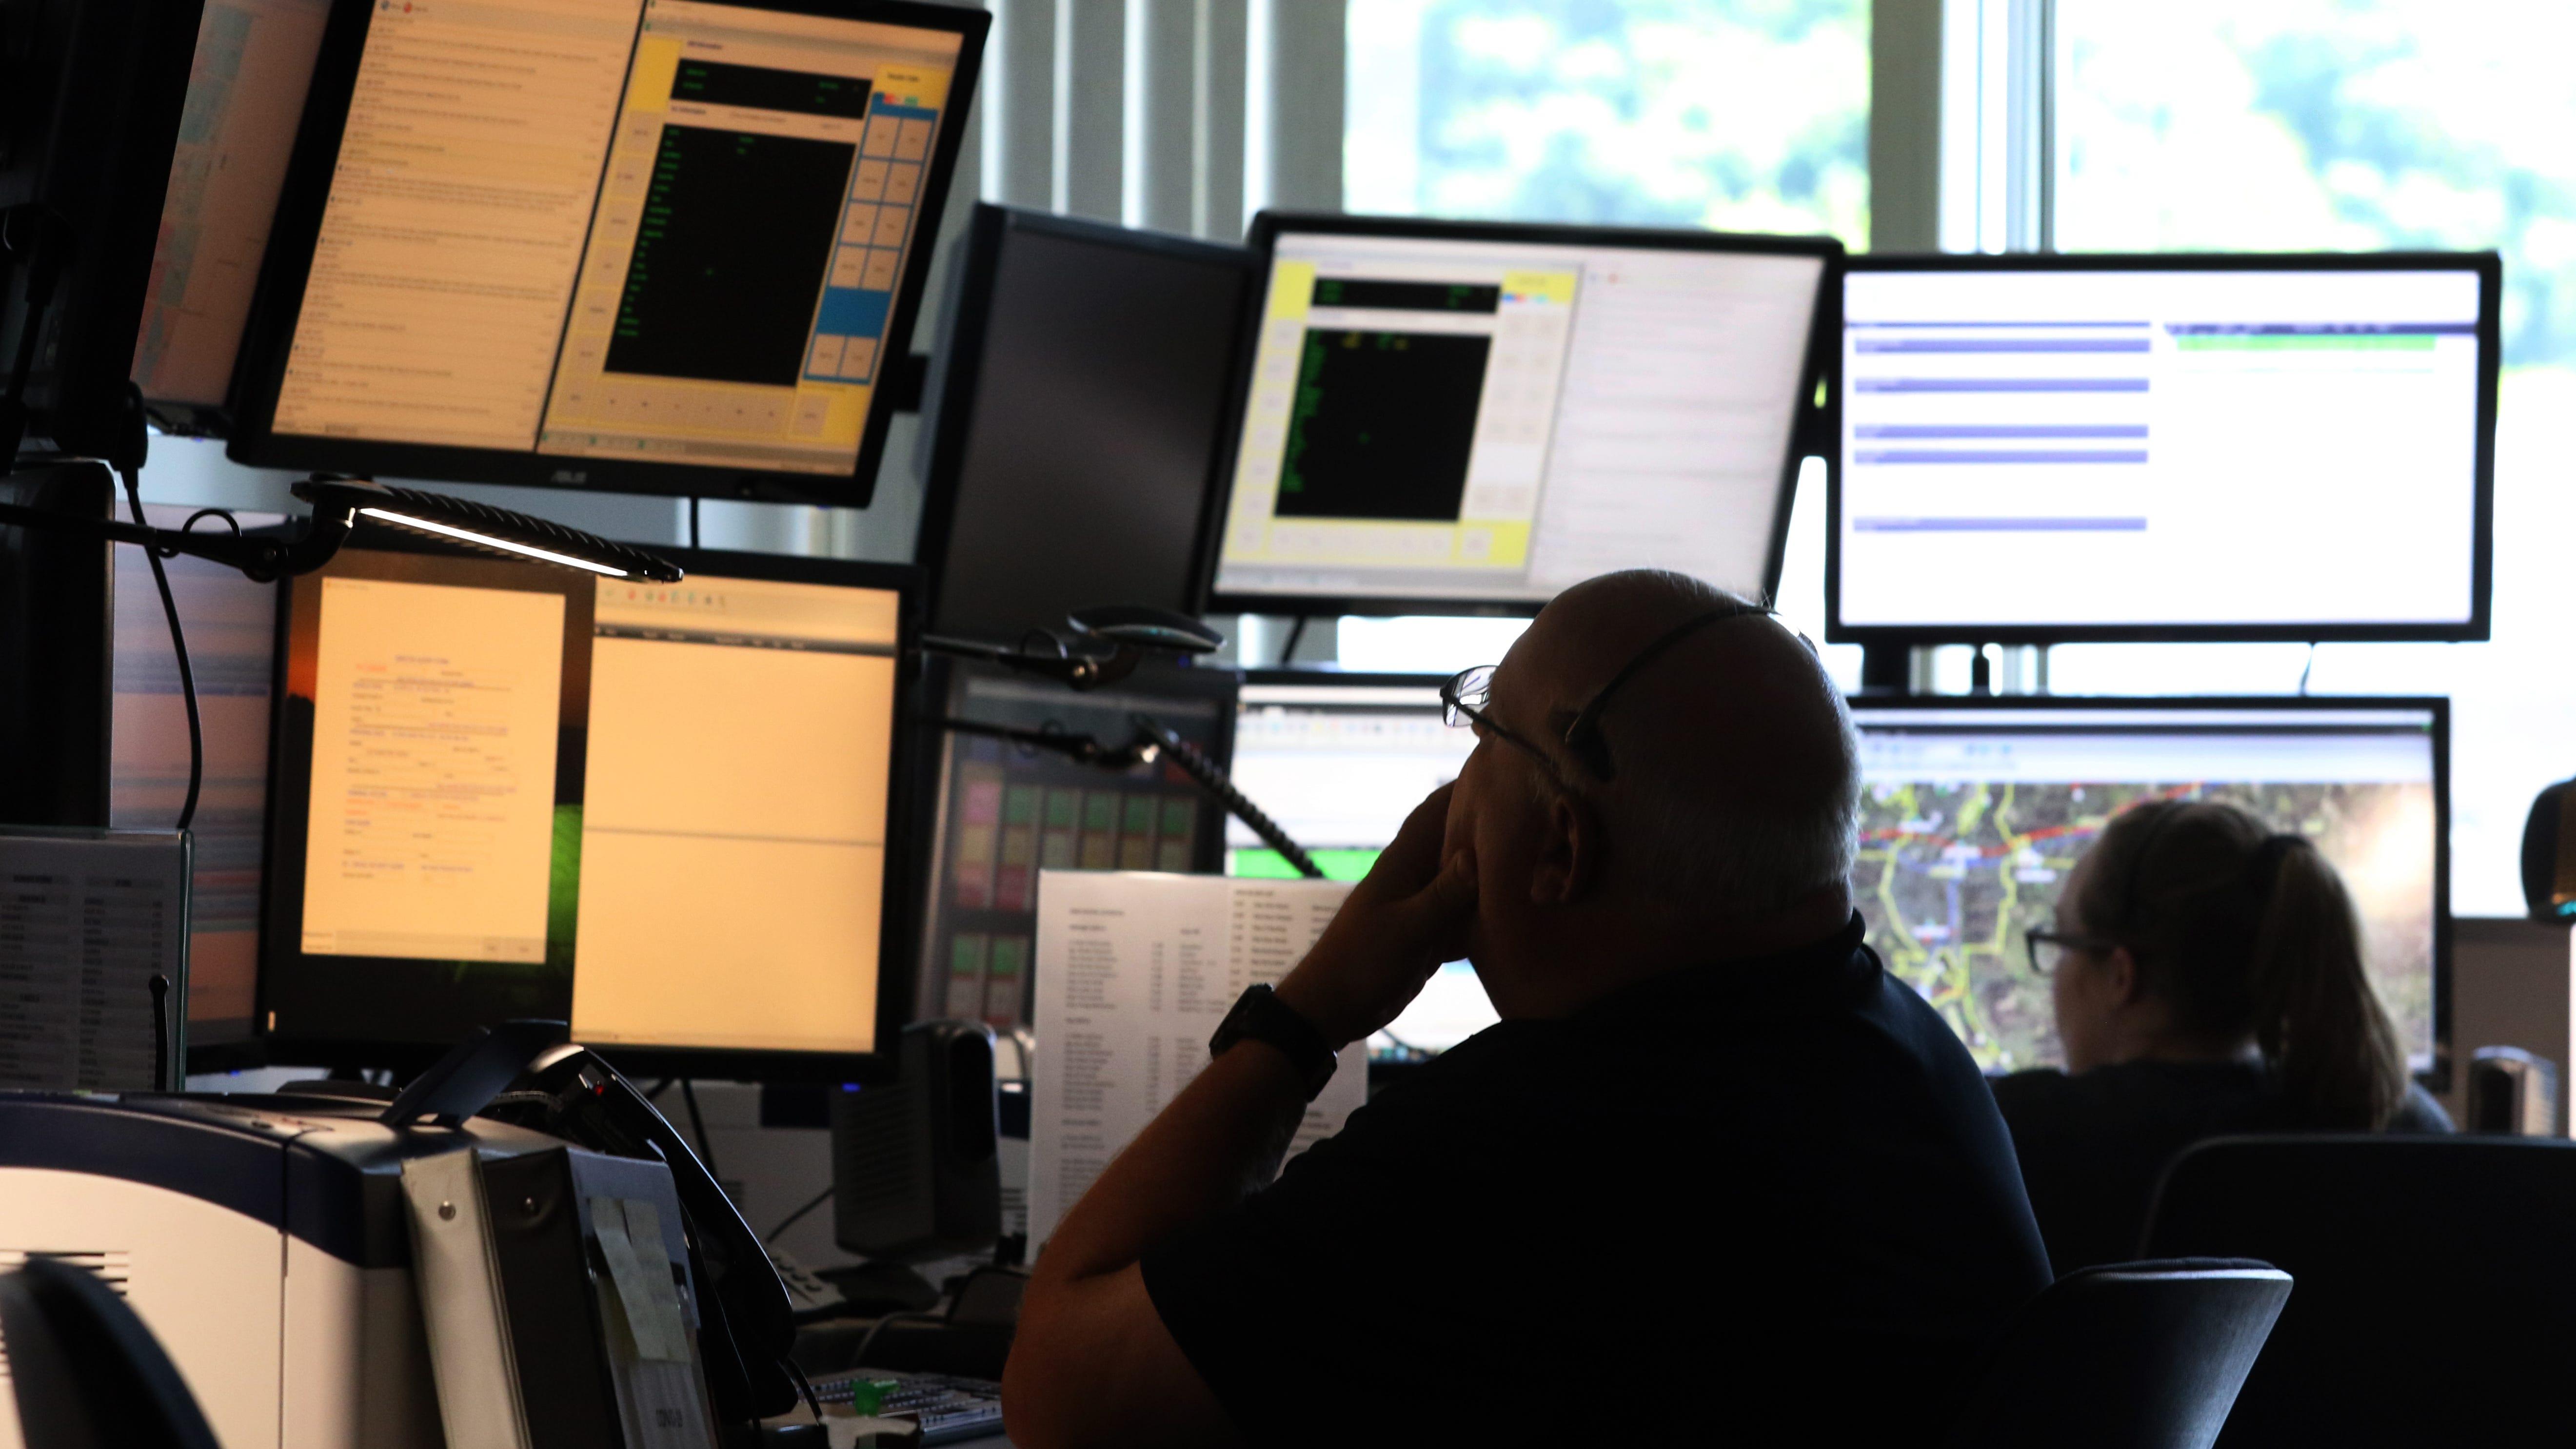 County looks to upgrade 911 equipment